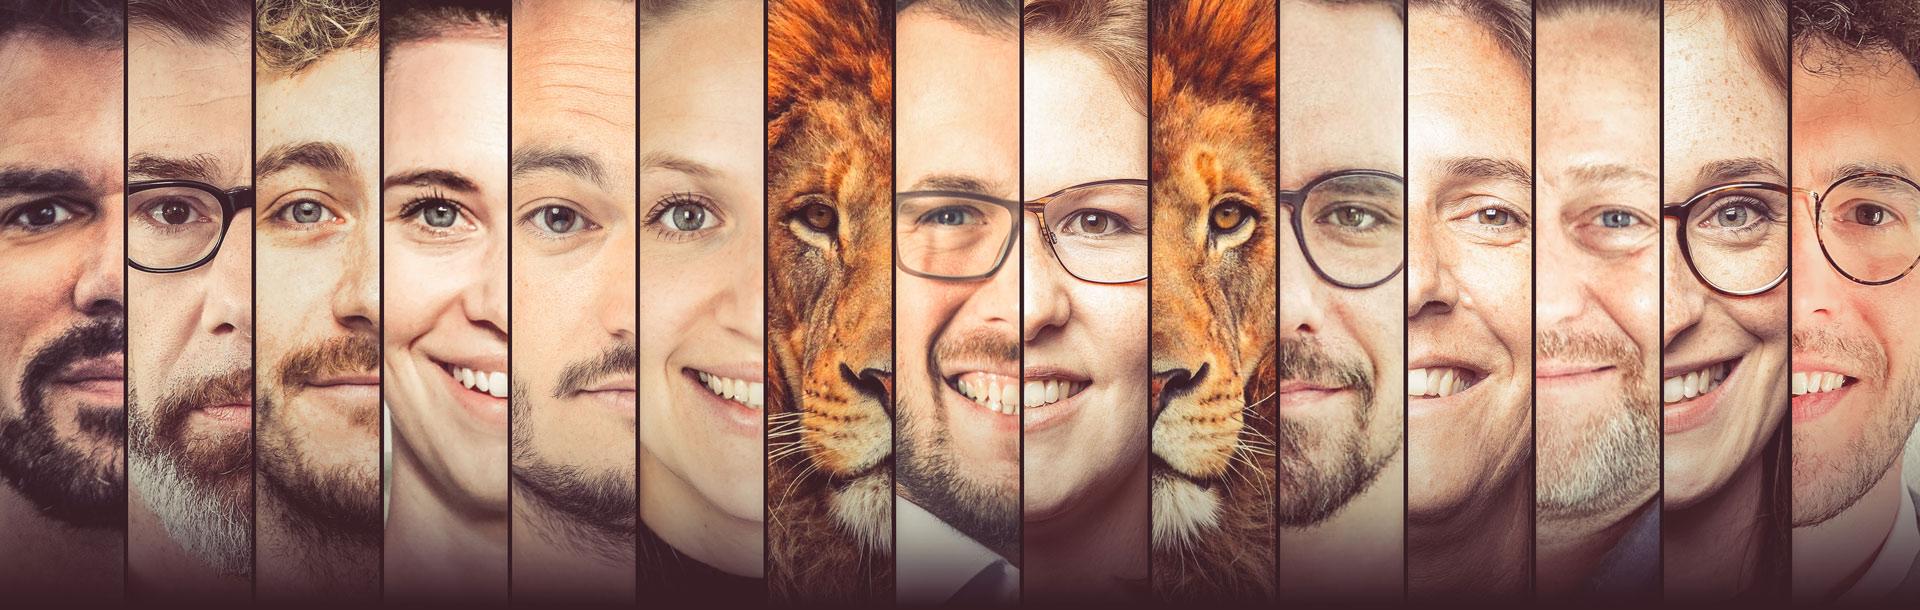 Agentur Ressmann | Cannes Lions BW